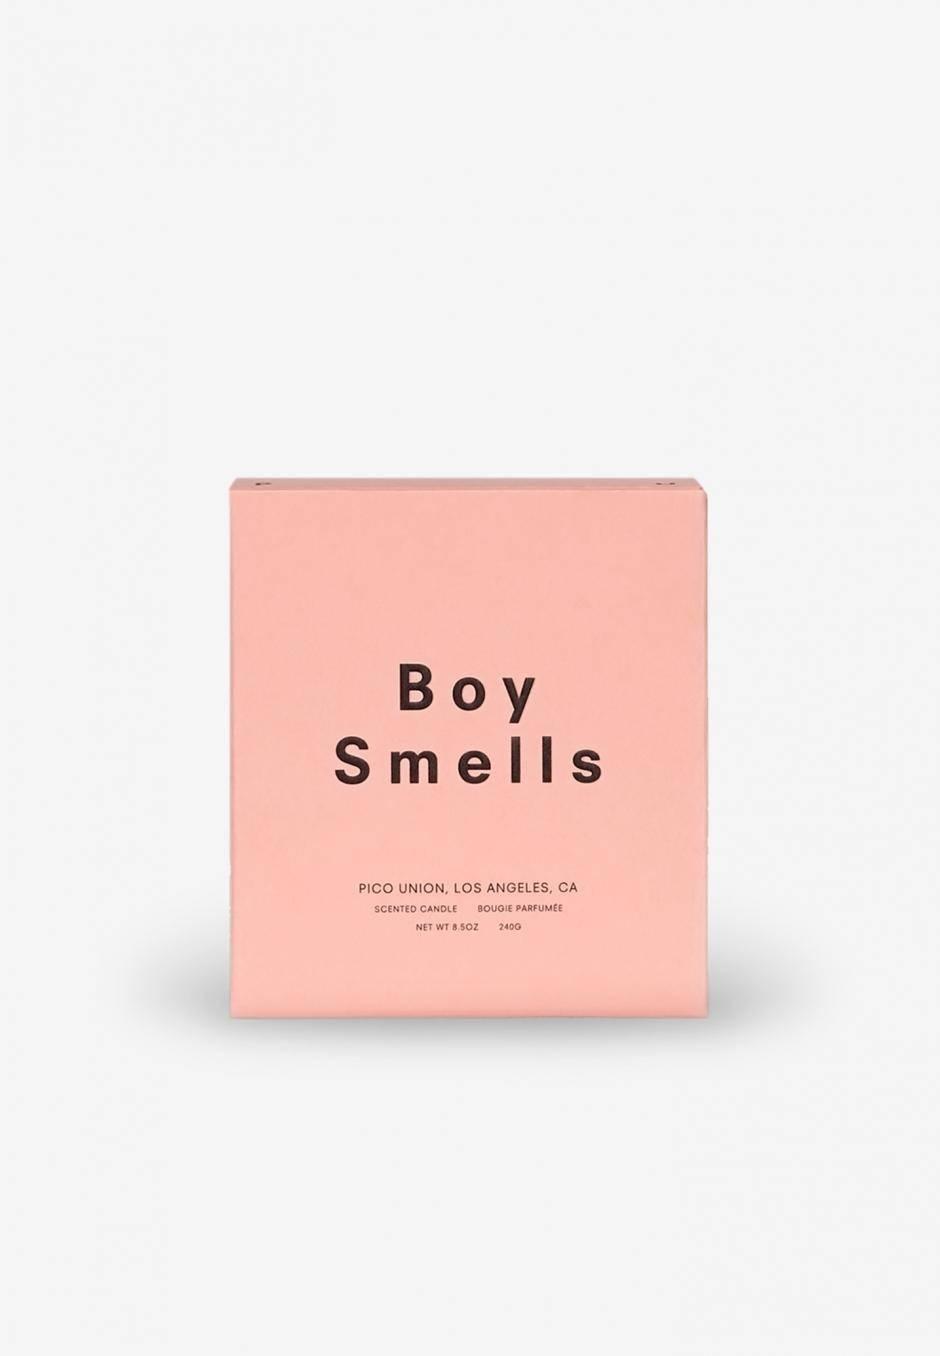 Boy Smells Les Candle